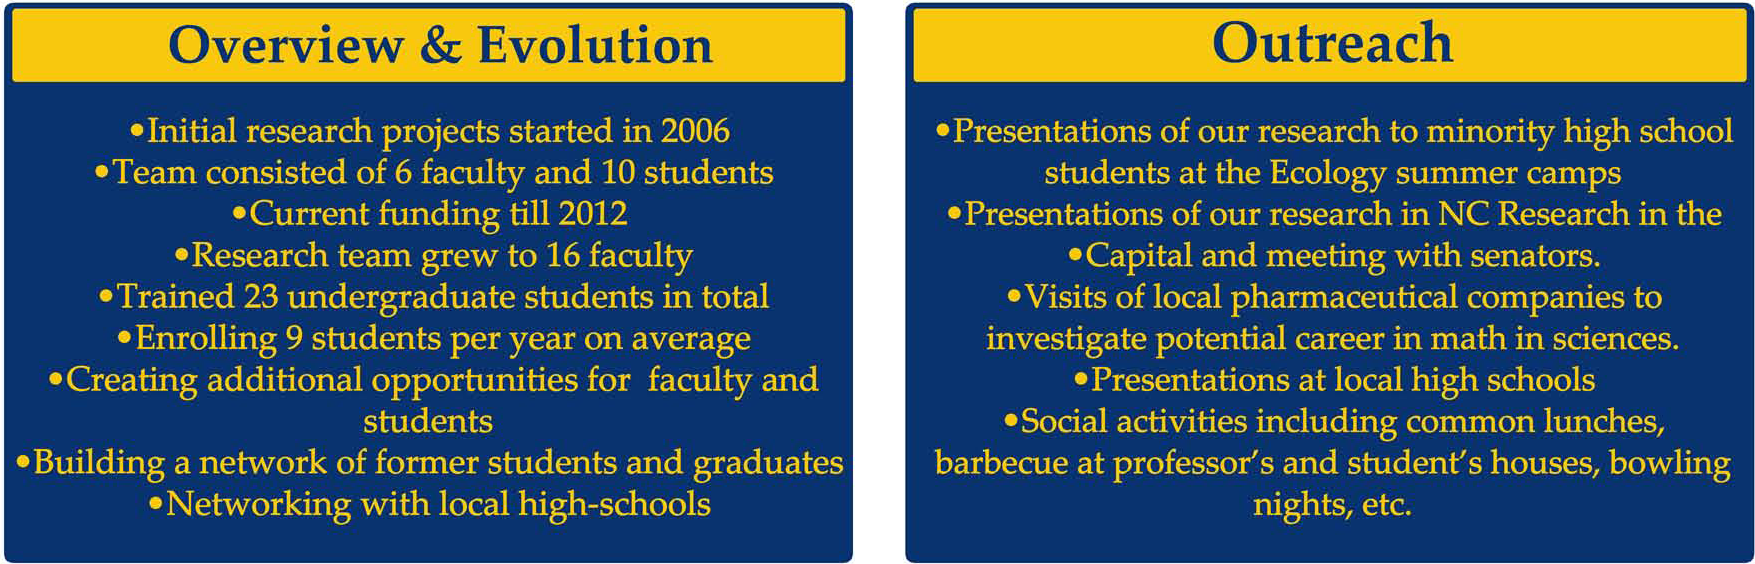 Overview & Evolution, Outreach